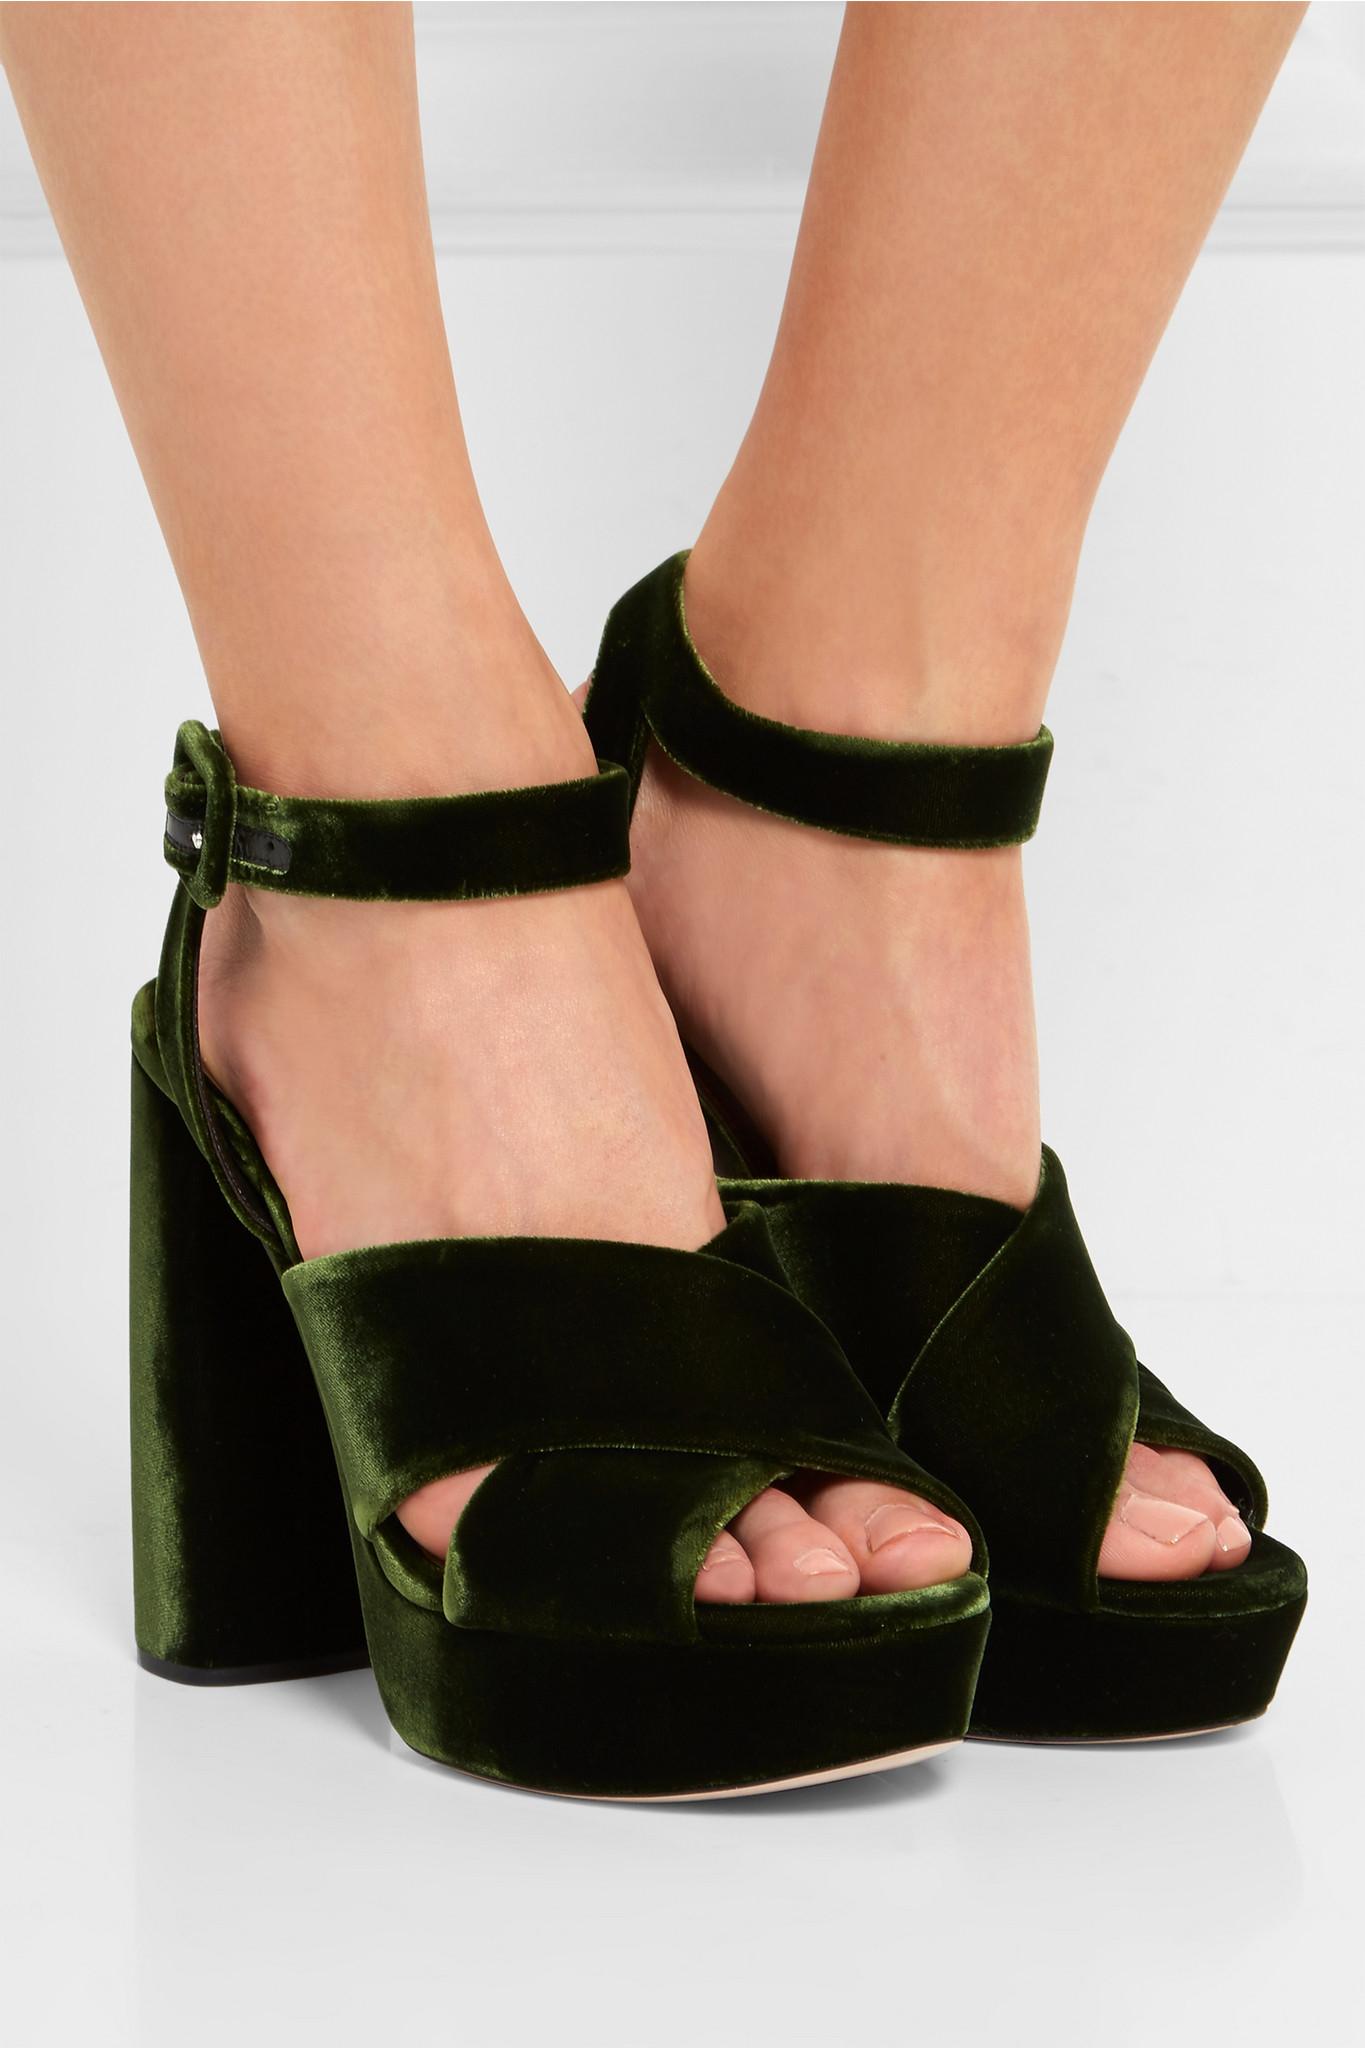 670318bb1a26 Lyst - Miu Miu Velvet Platform Sandals in Black